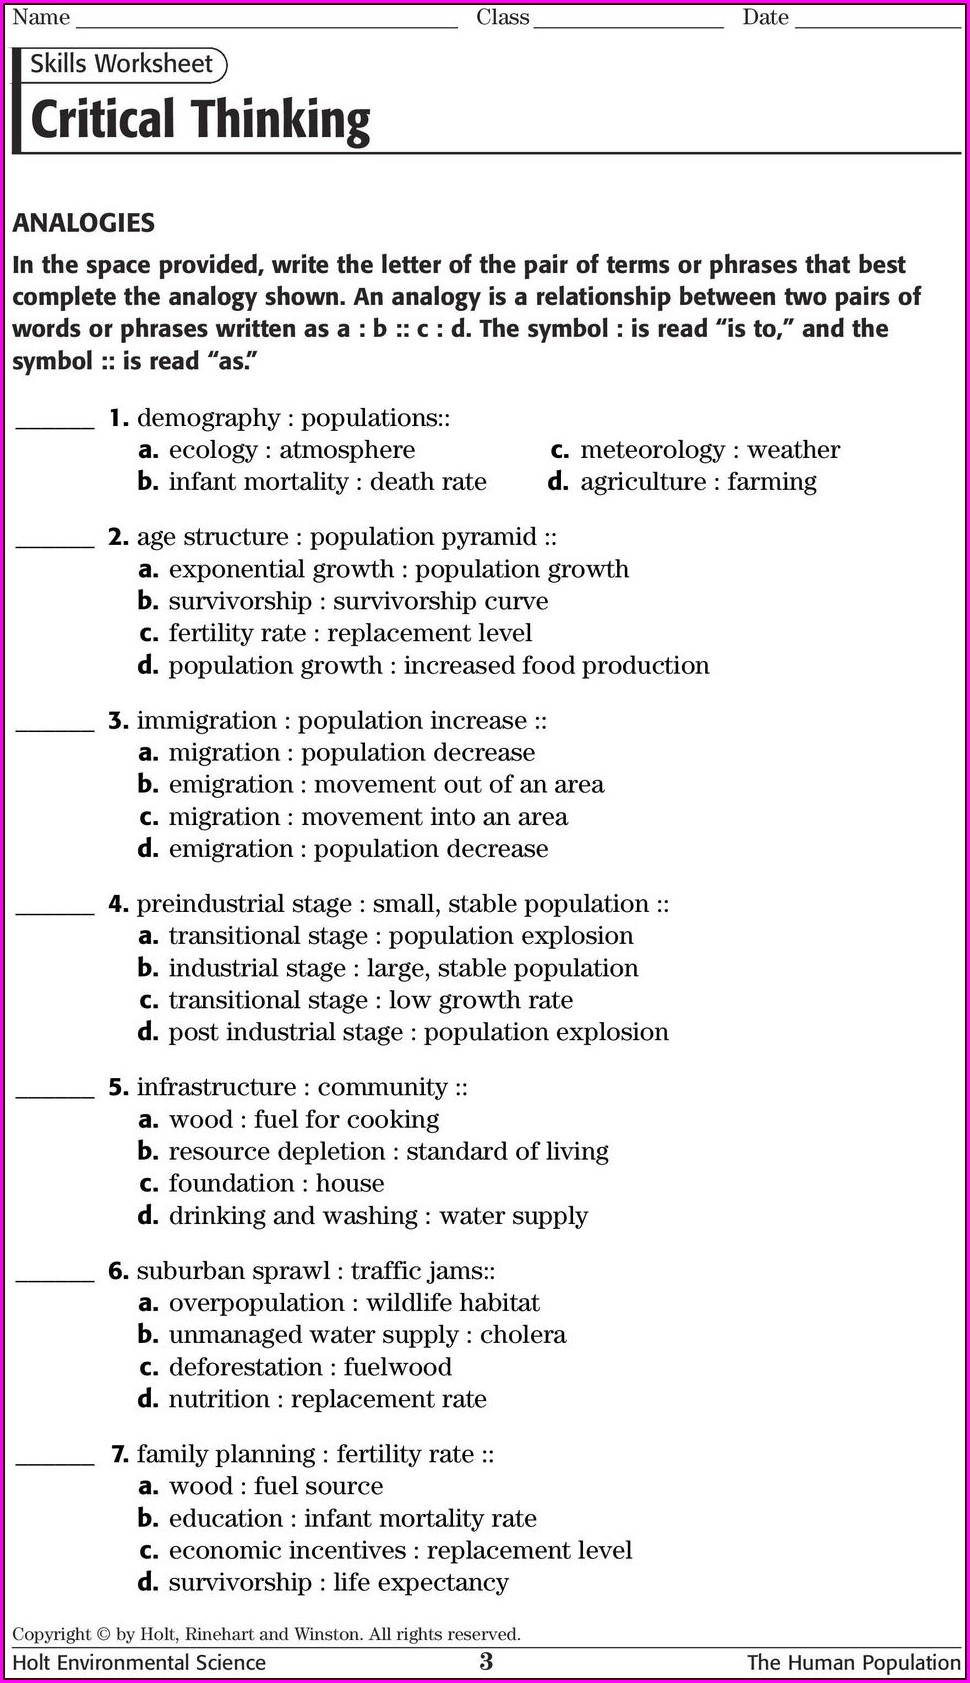 Skills Worksheet Map Skills Disease Distribution Answer Key